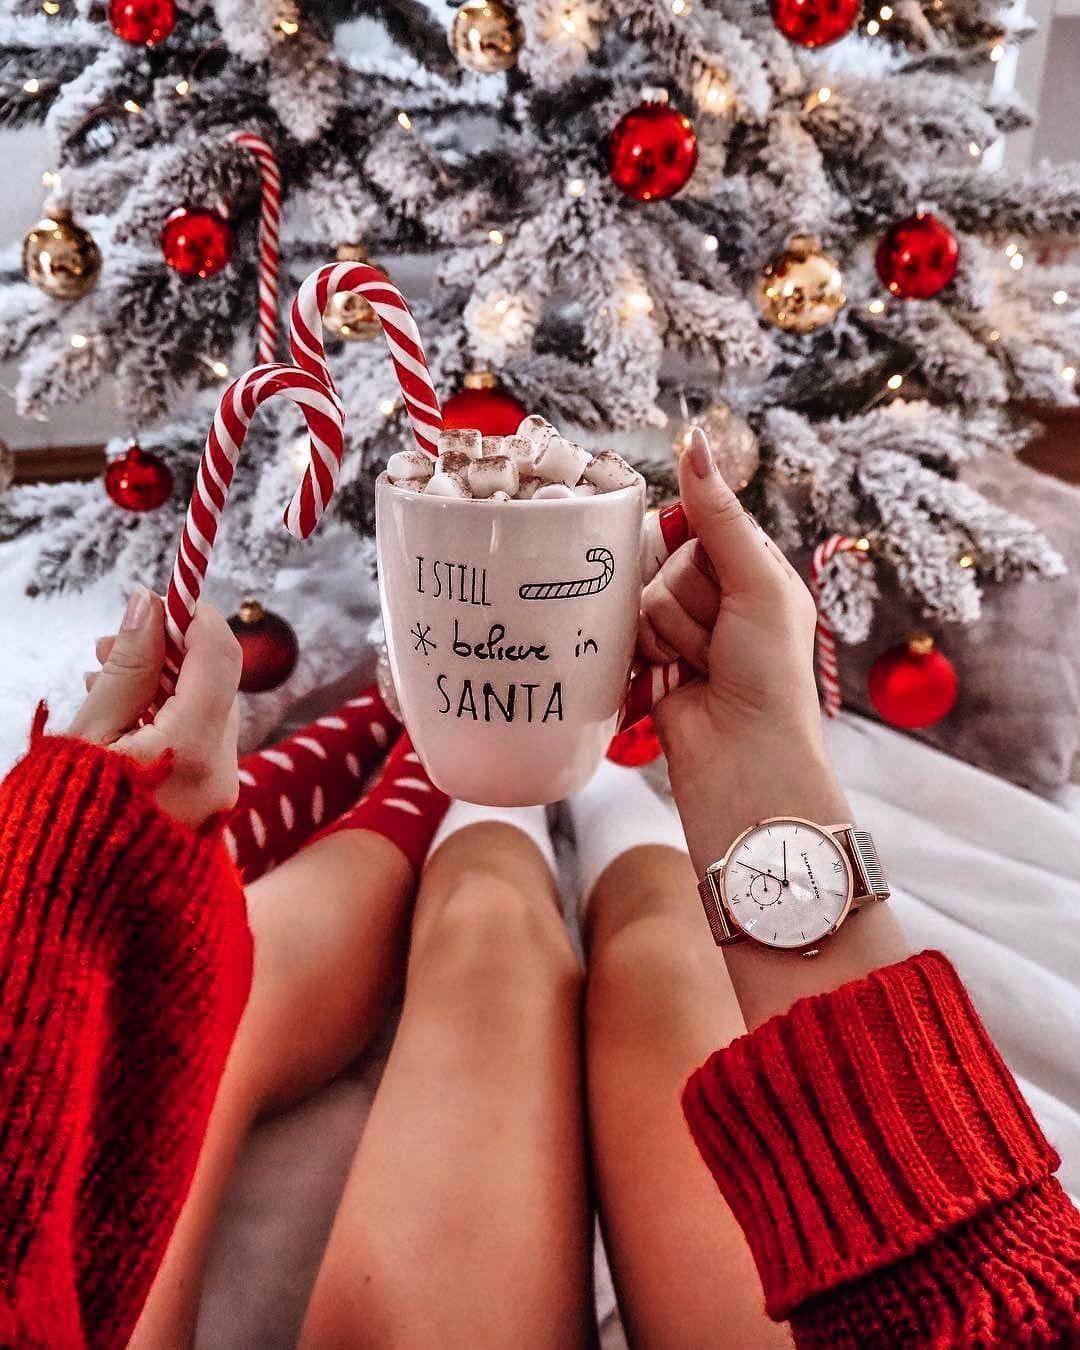 I still believe in Santa #xmas #christmas #santaclaus   Cosy christmas, Christmas  aesthetic, Instagram christmas